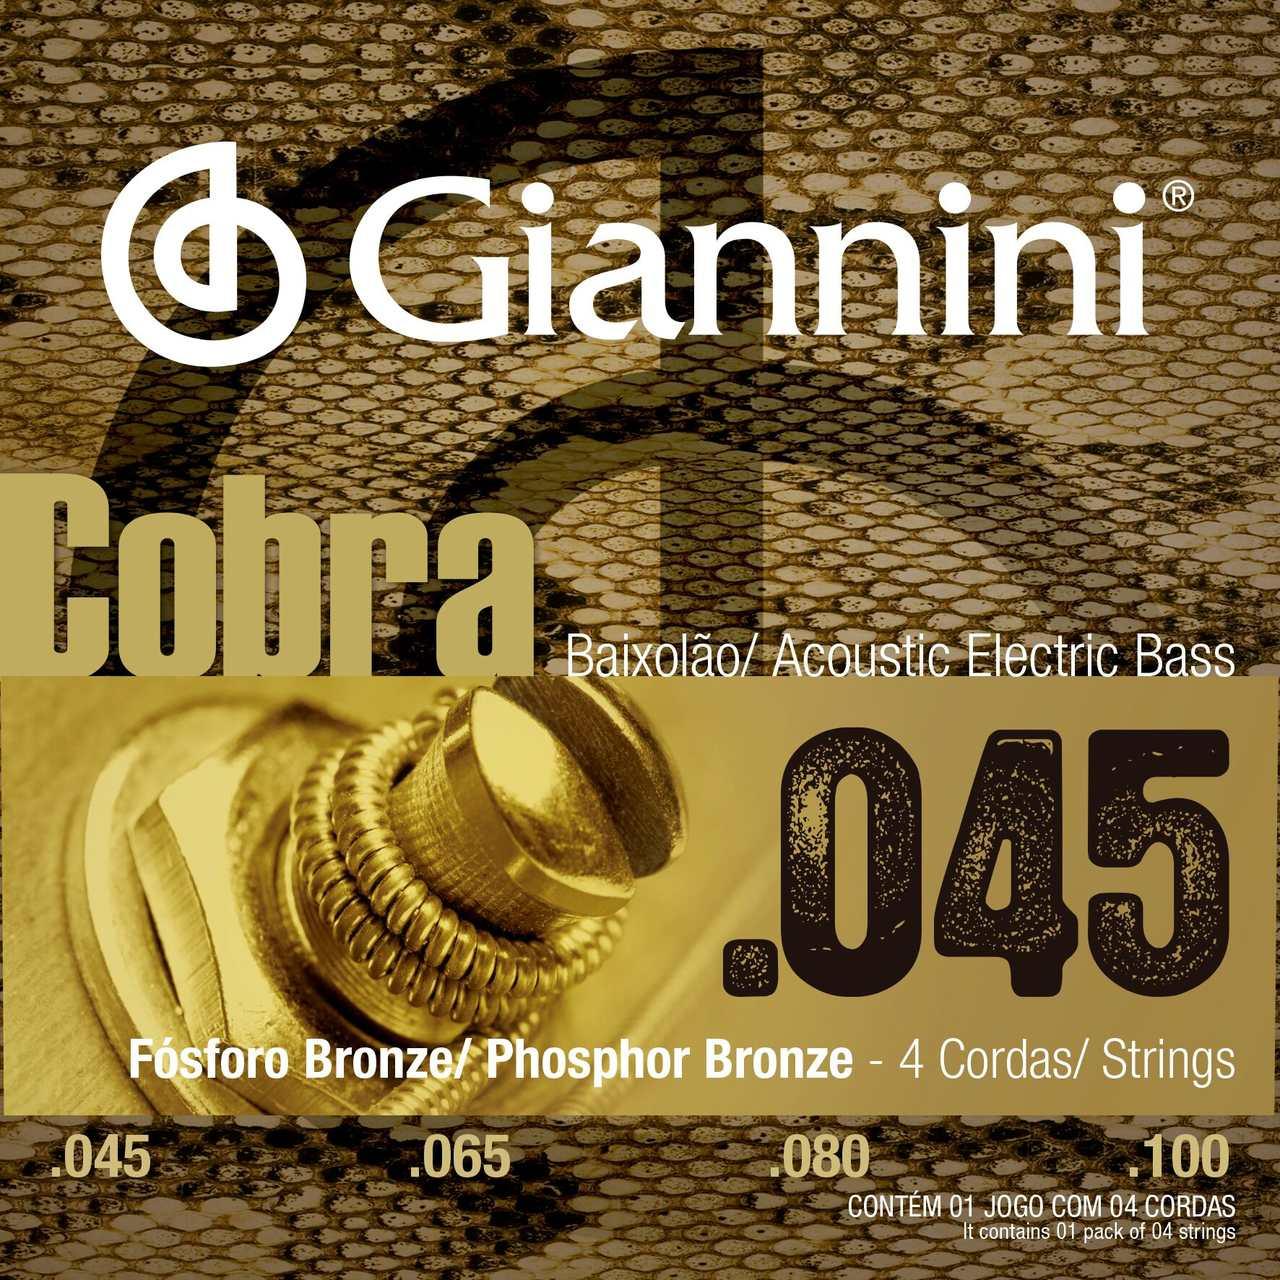 "Encordoamento p/Baixolão Giannini 4c Fósforo Bronze 0.045/0.100"" - GEEBASF"